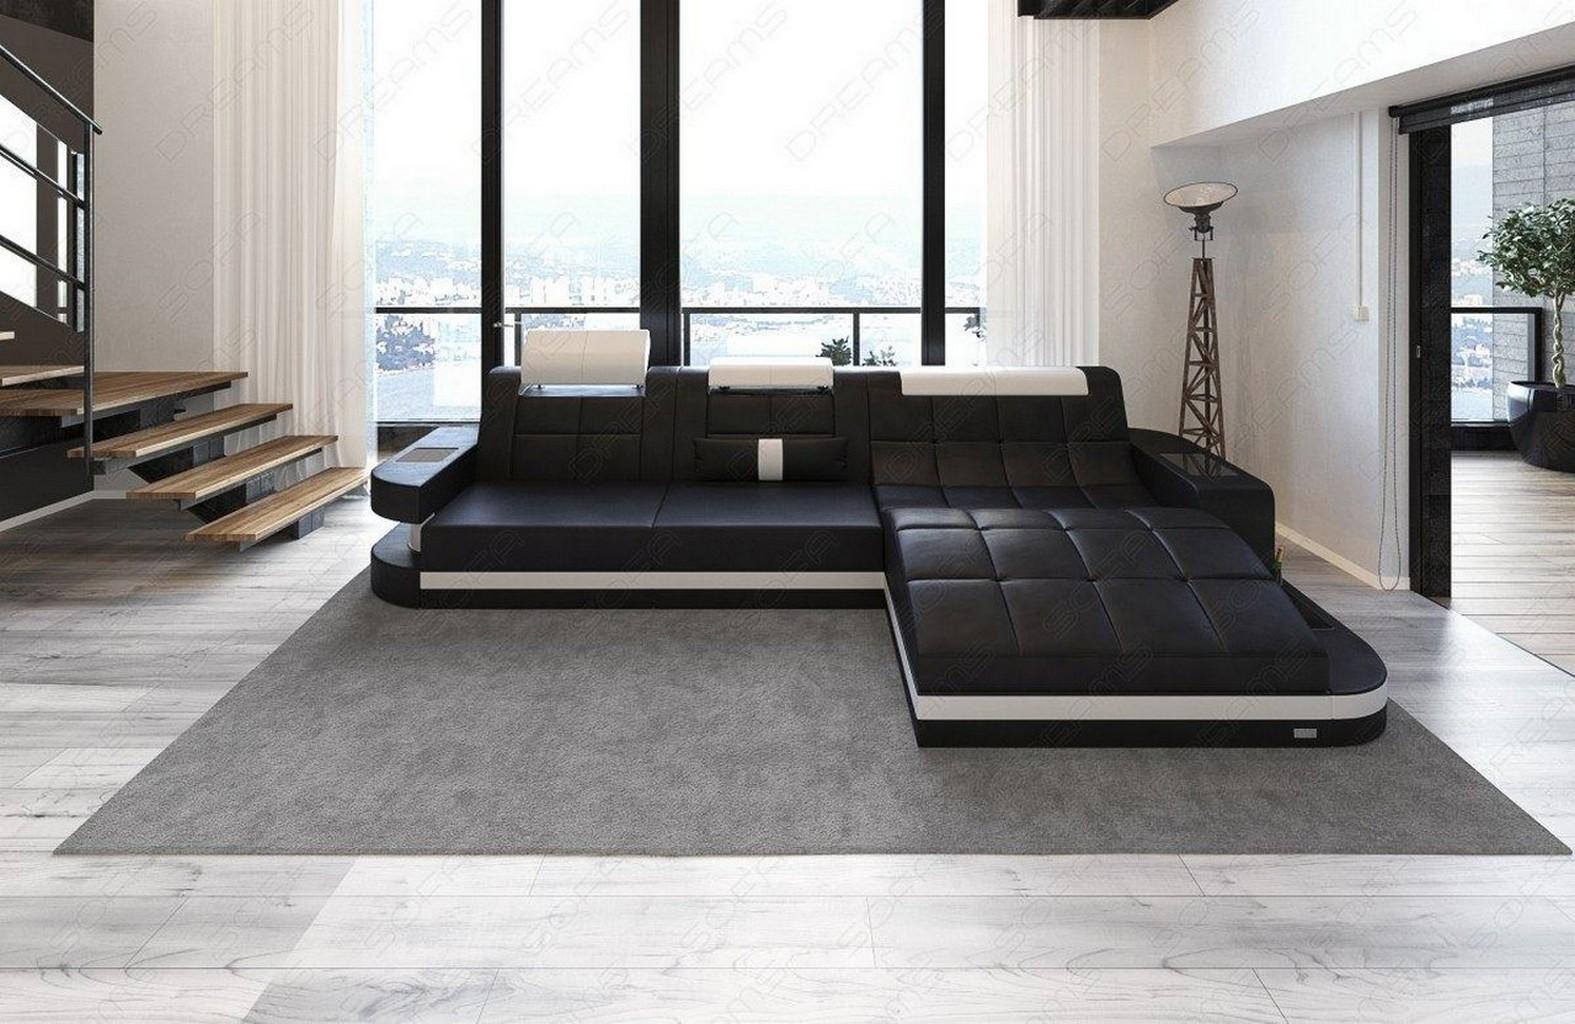 ledersofa couch wave l mit led beleuchtung ottomane schwarz weiss lagerware ebay. Black Bedroom Furniture Sets. Home Design Ideas